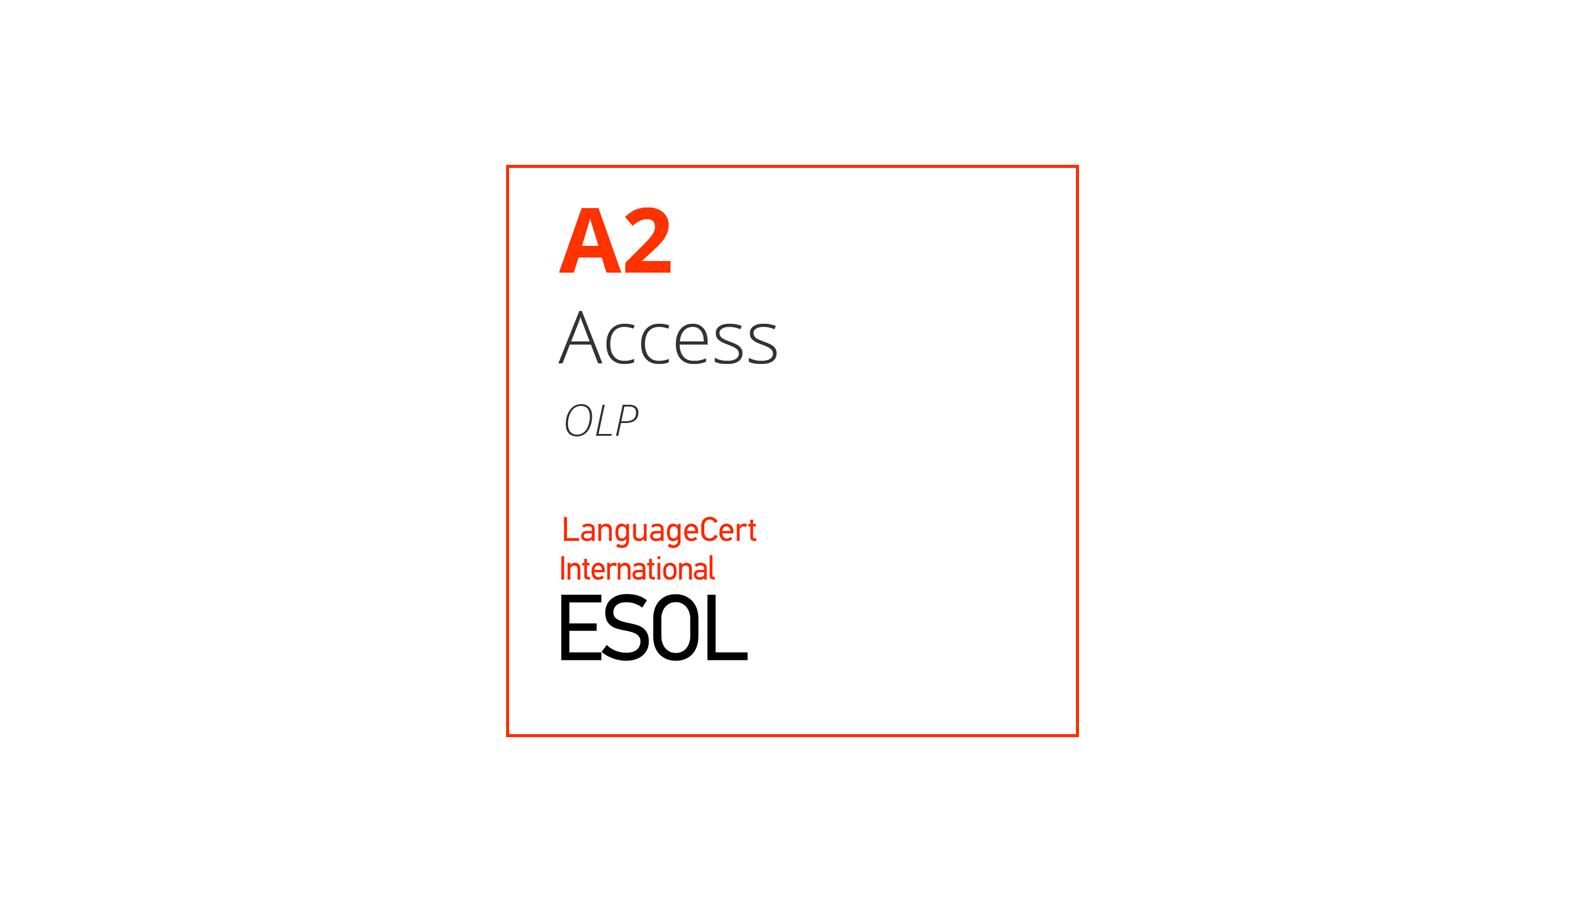 Esame di inglese online A2 LanguageCert International ESOL